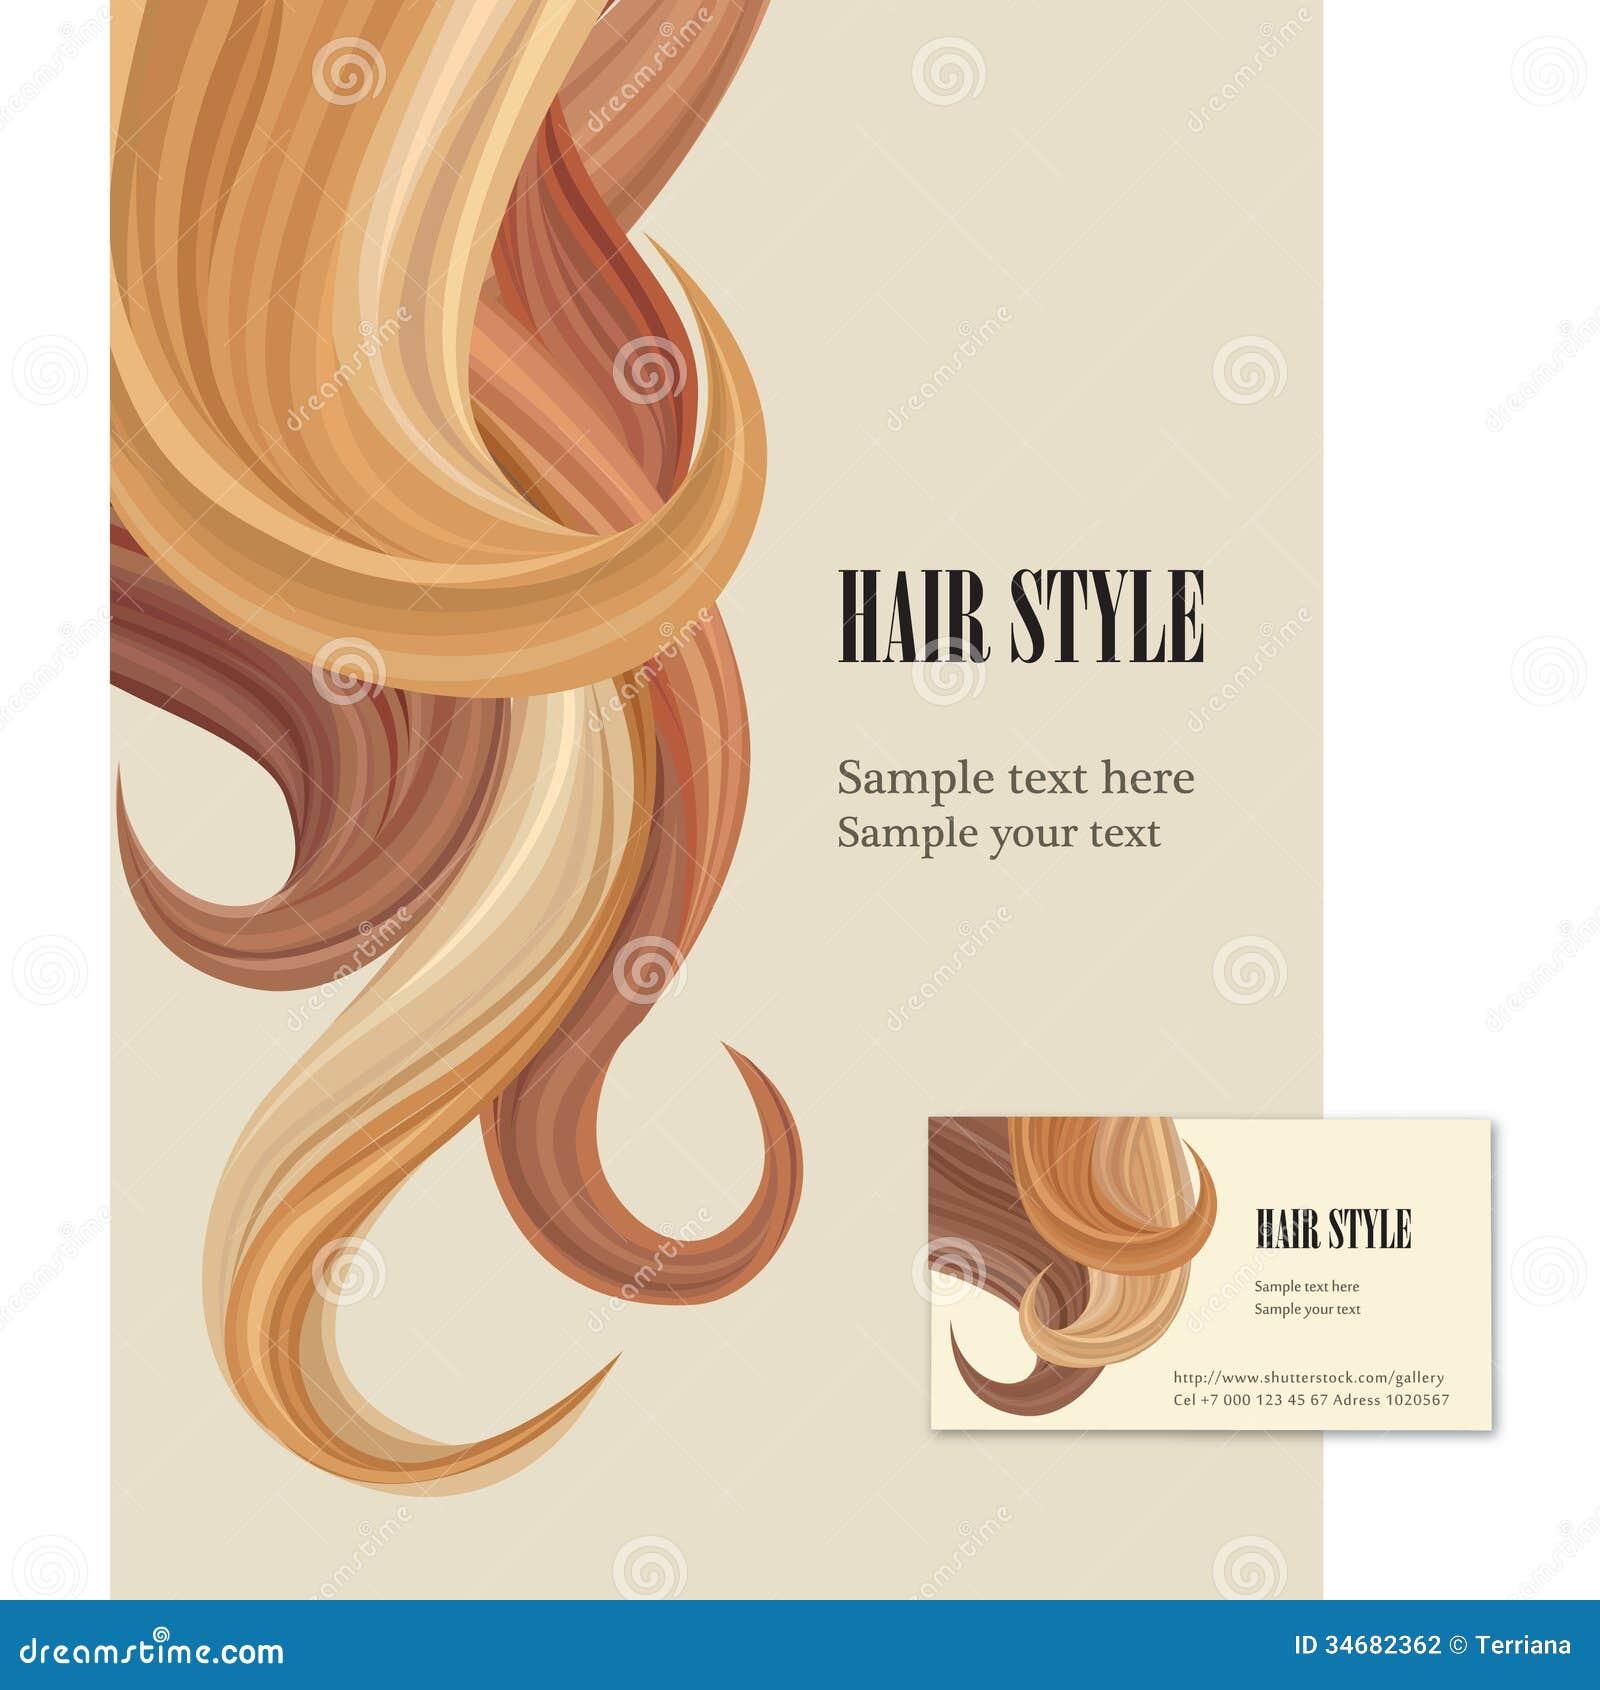 hairstyle background - photo #15